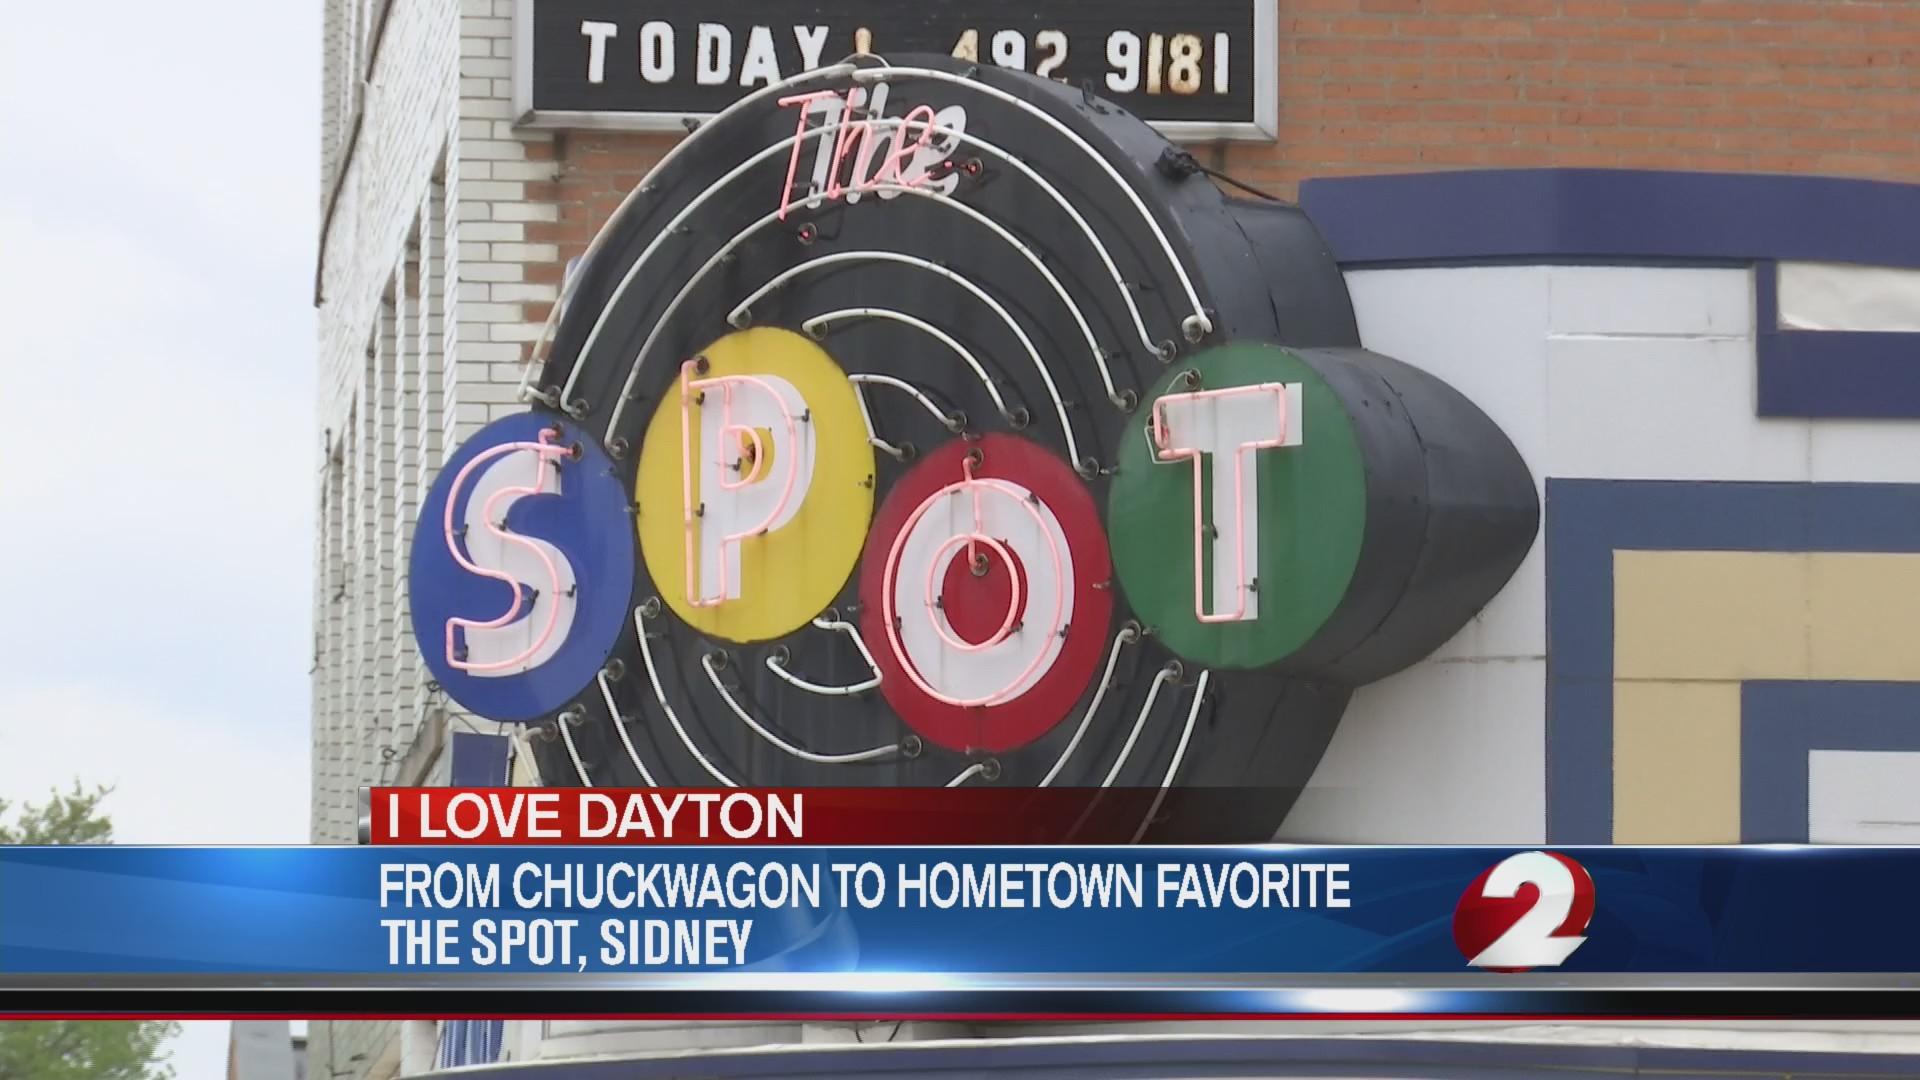 I Love Dayton: From chuckwagon to hometown favorite